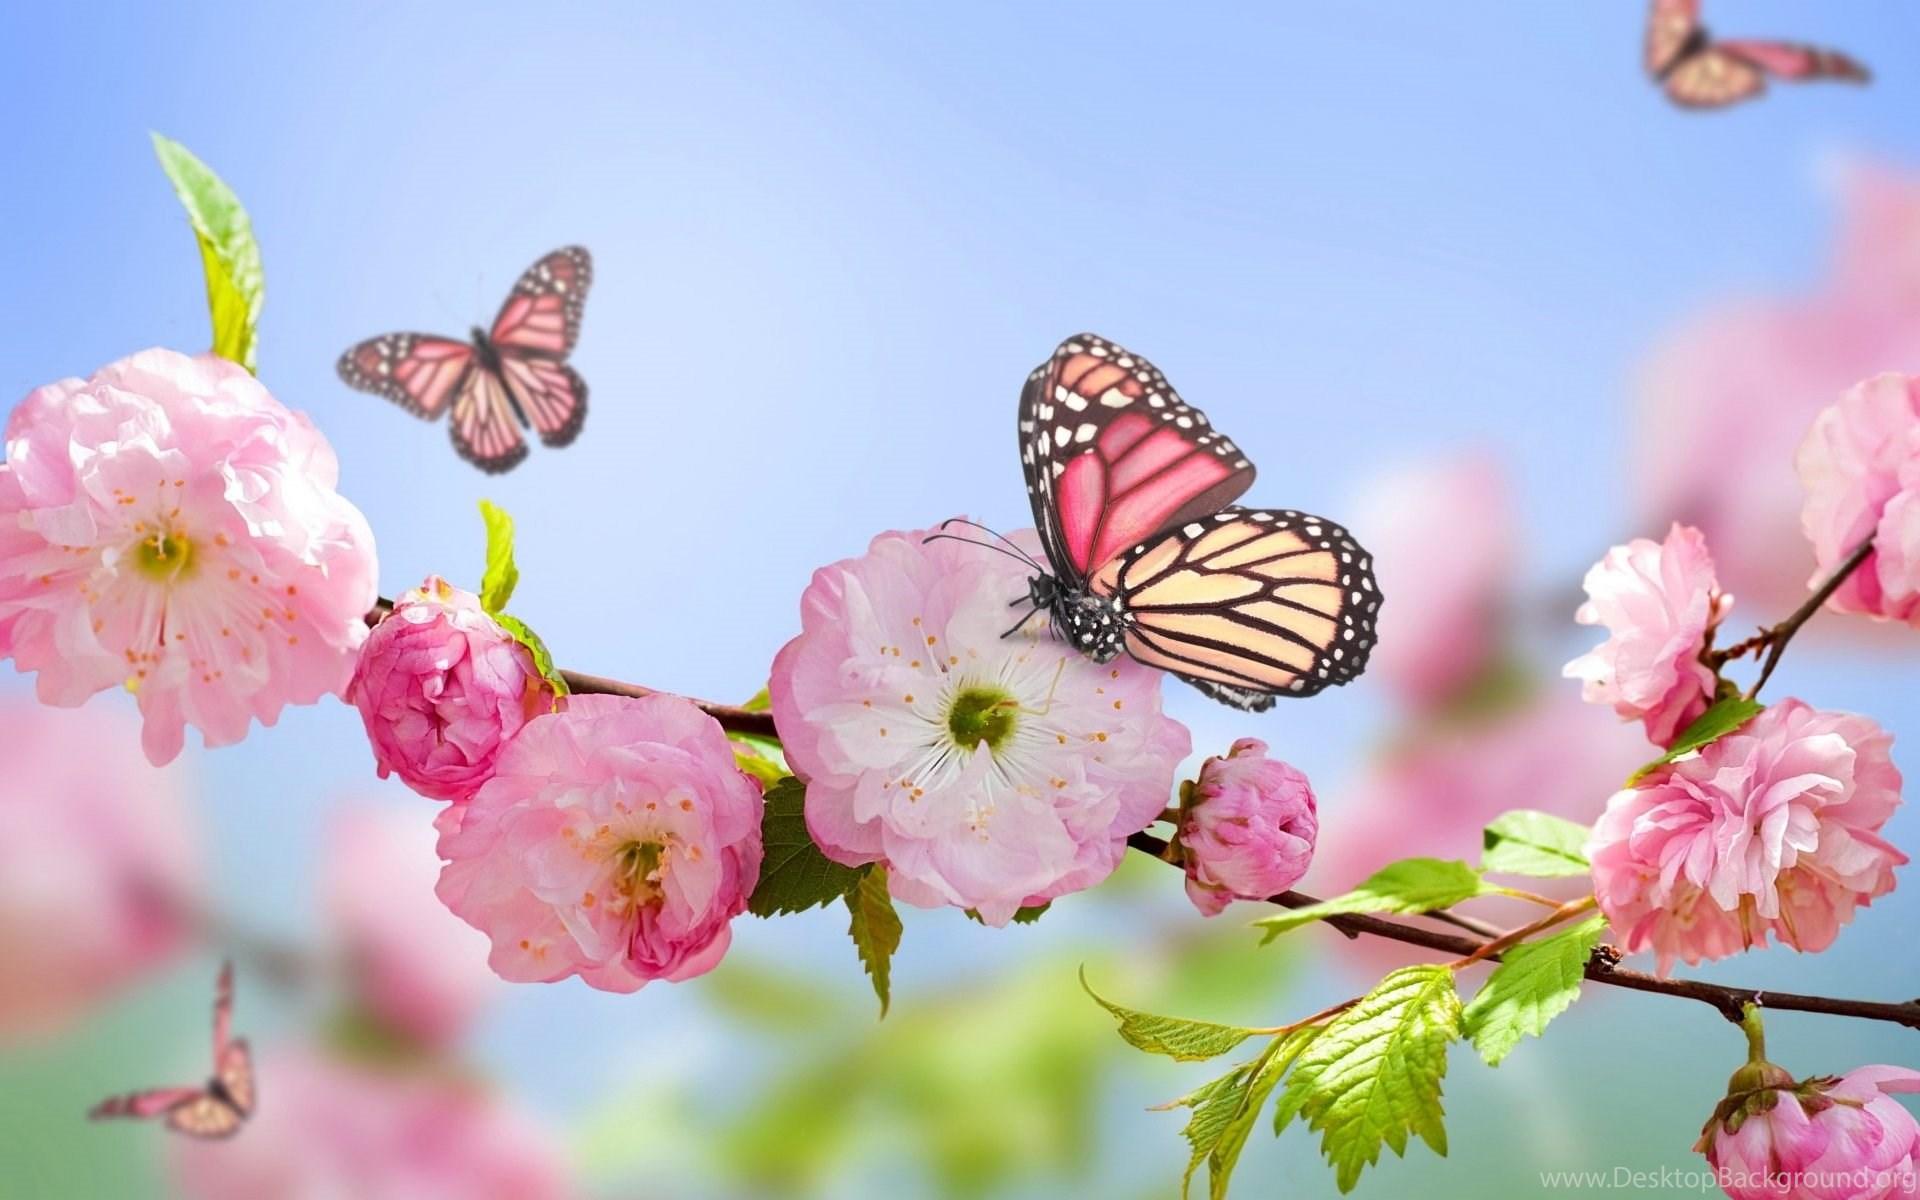 Spring Flowers And Butterflies Wallpapers Popular Flowers Desktop